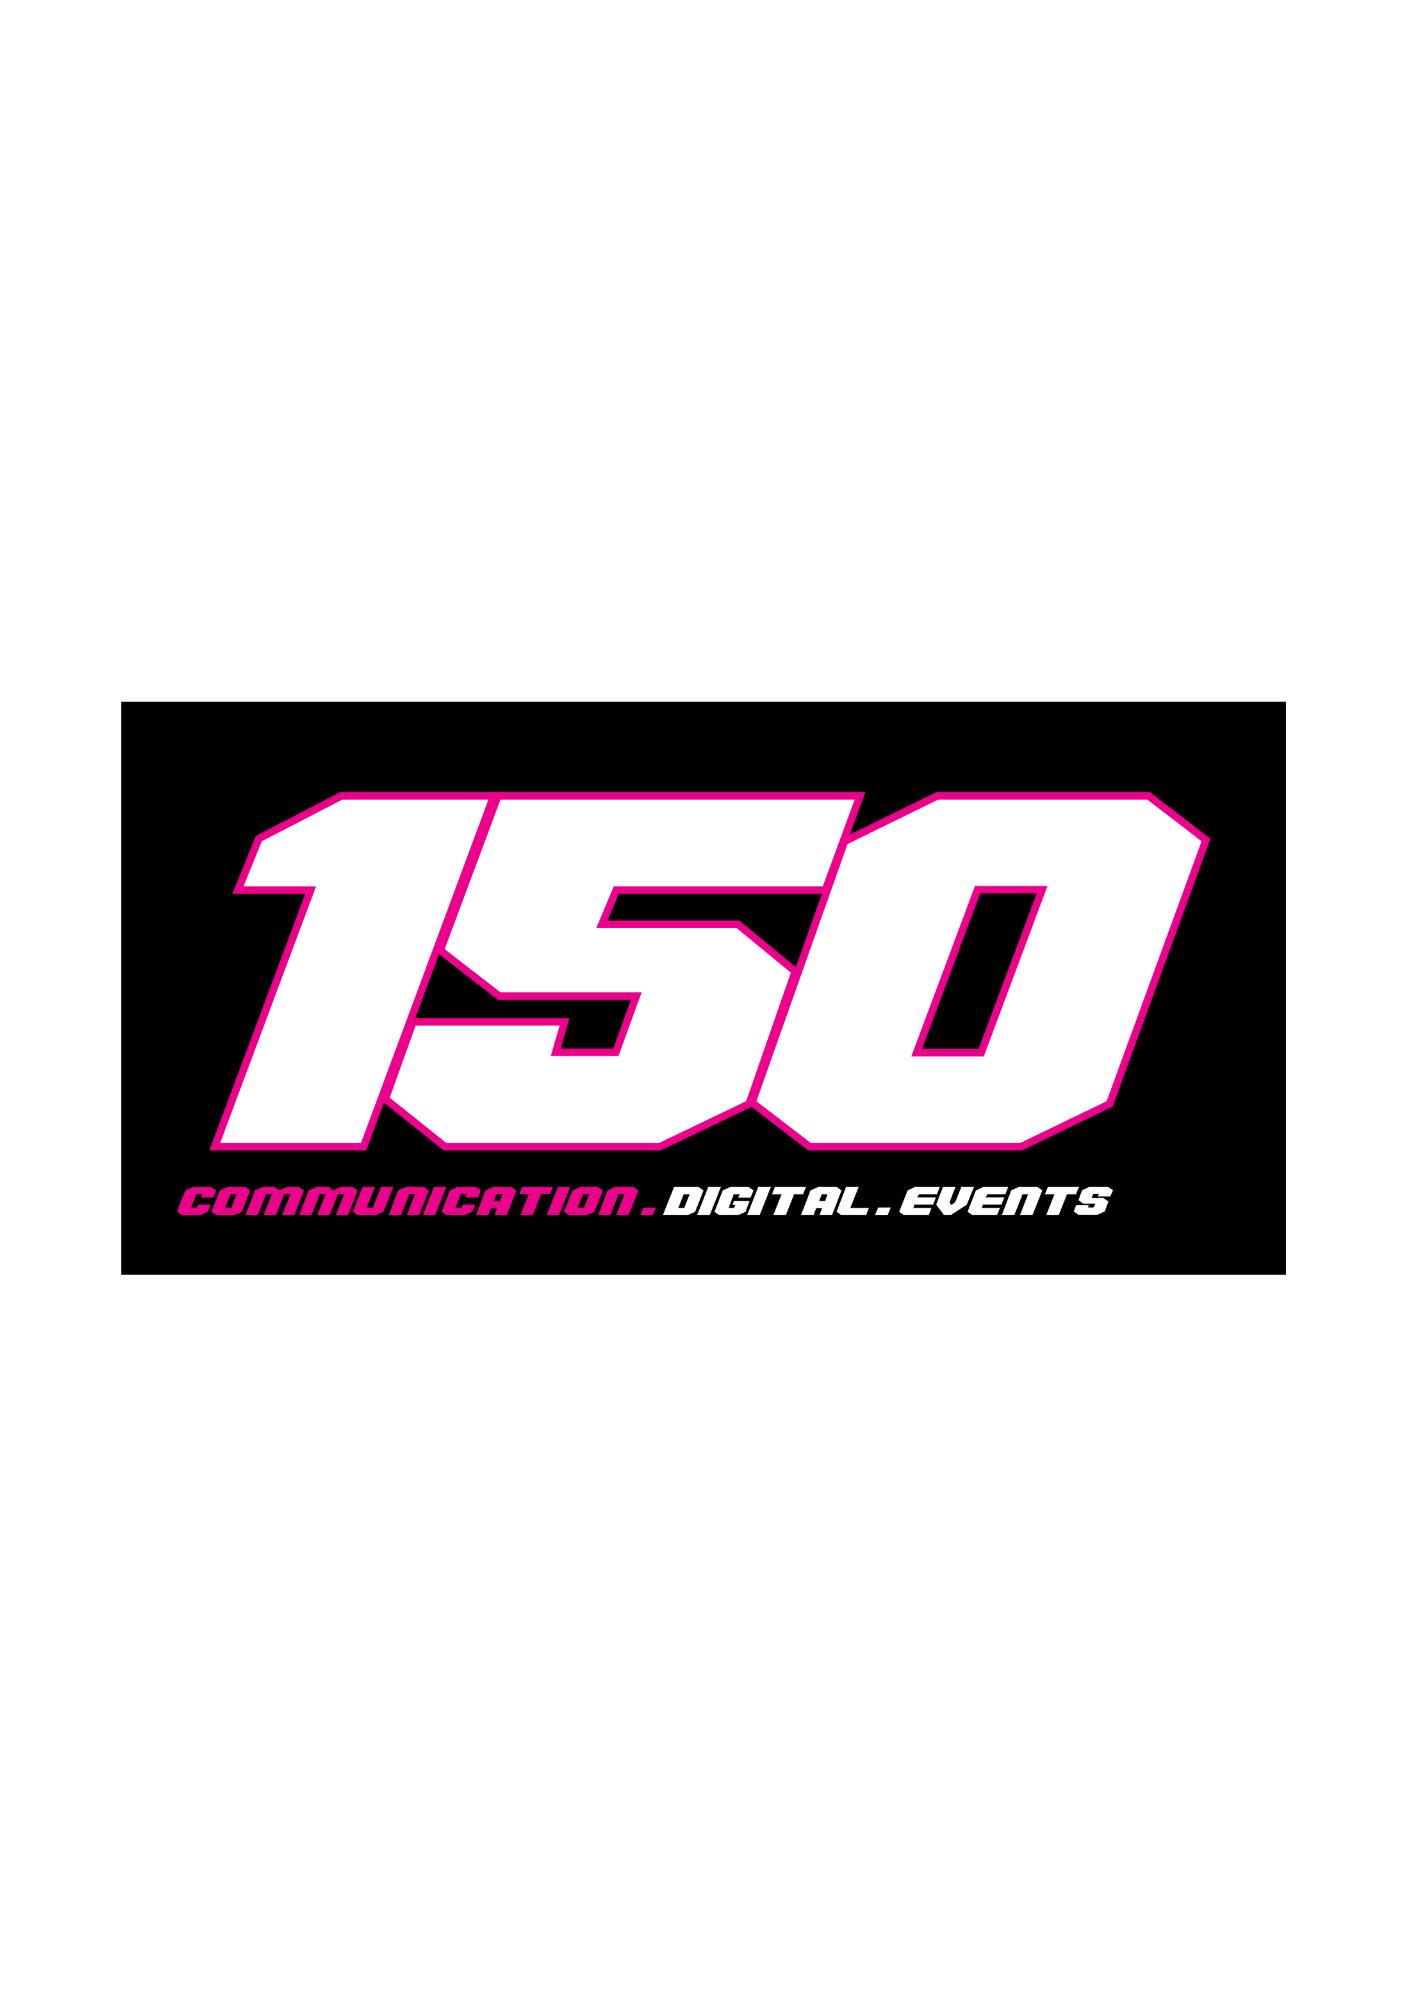 150 COMMUNICATION